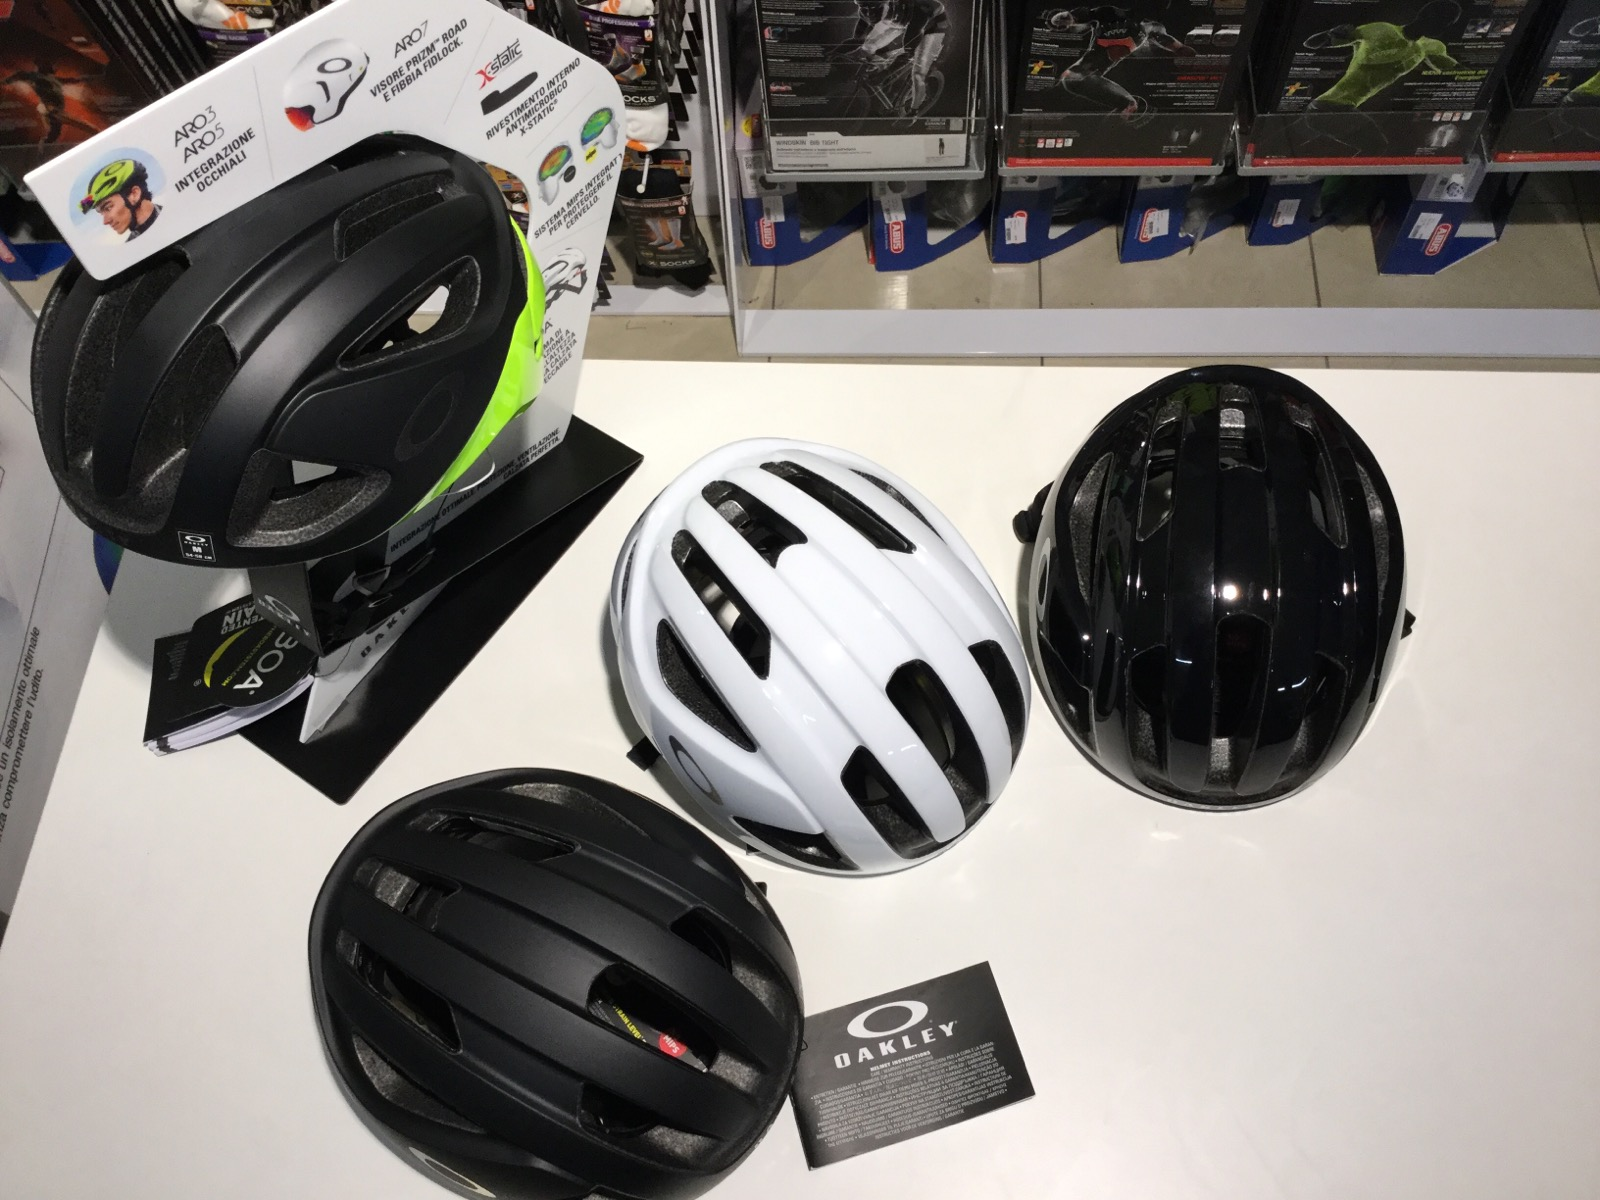 casco oakley da bici